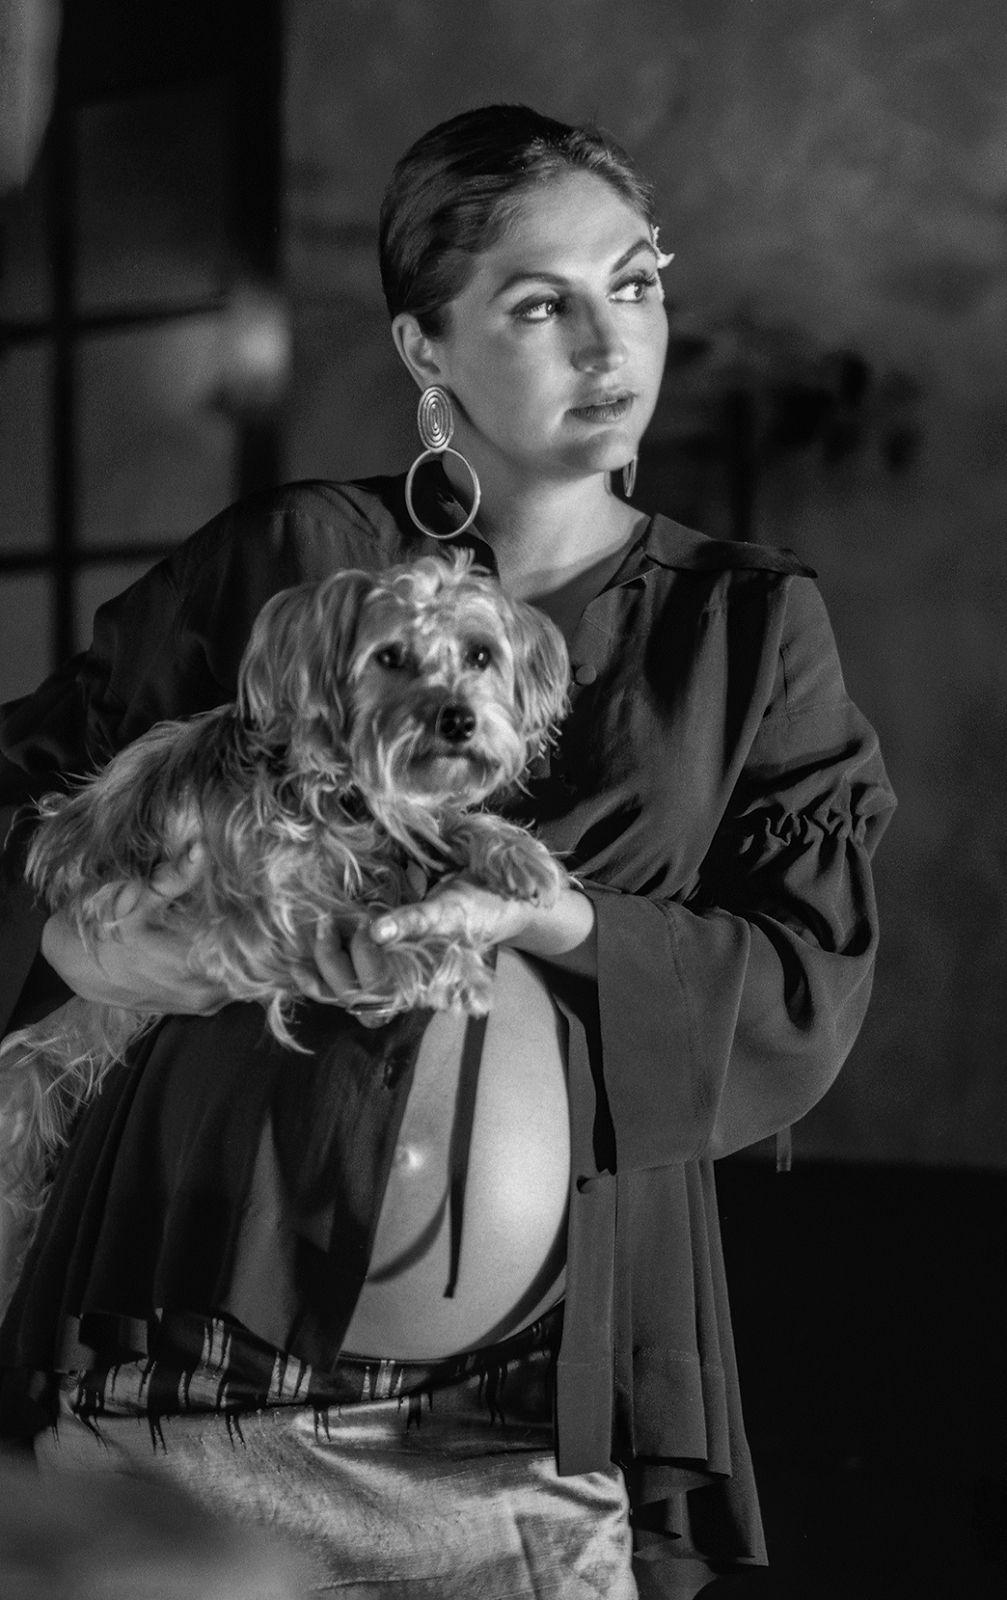 Ruth Godfrey (actress) Adult pics & movies Linda Sini,Nicole Theriault